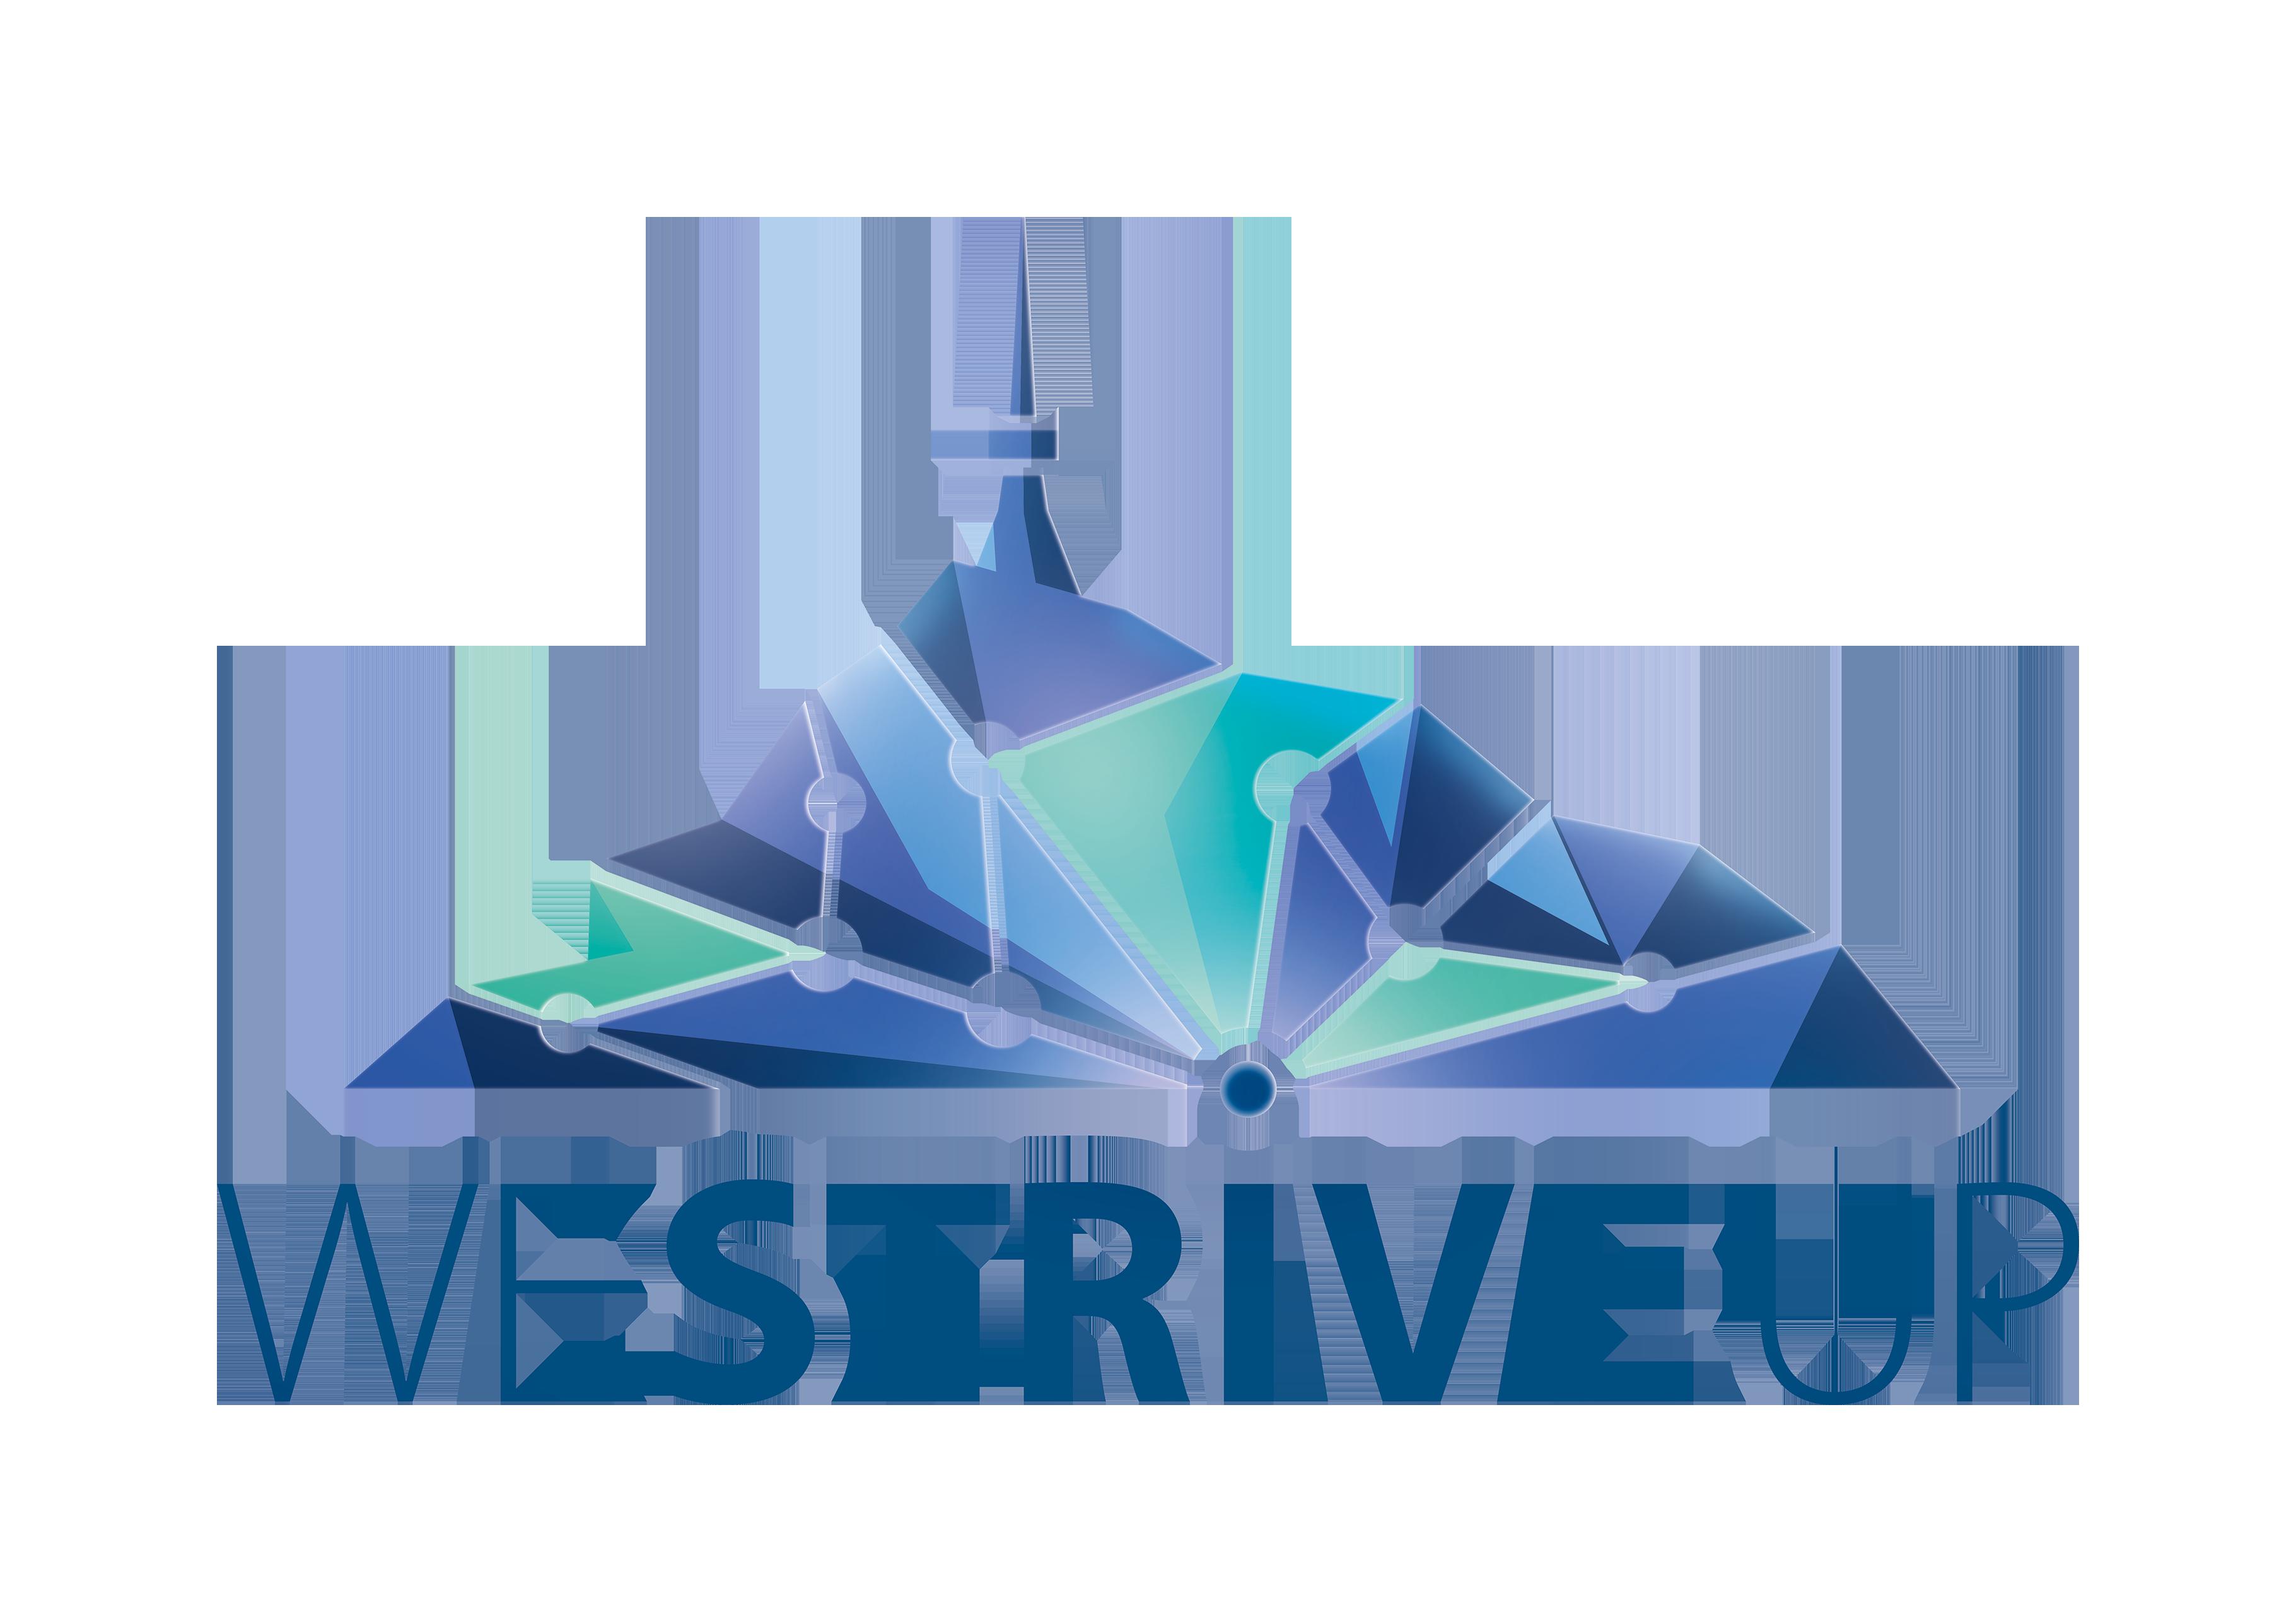 Logo WESTRIVEUP